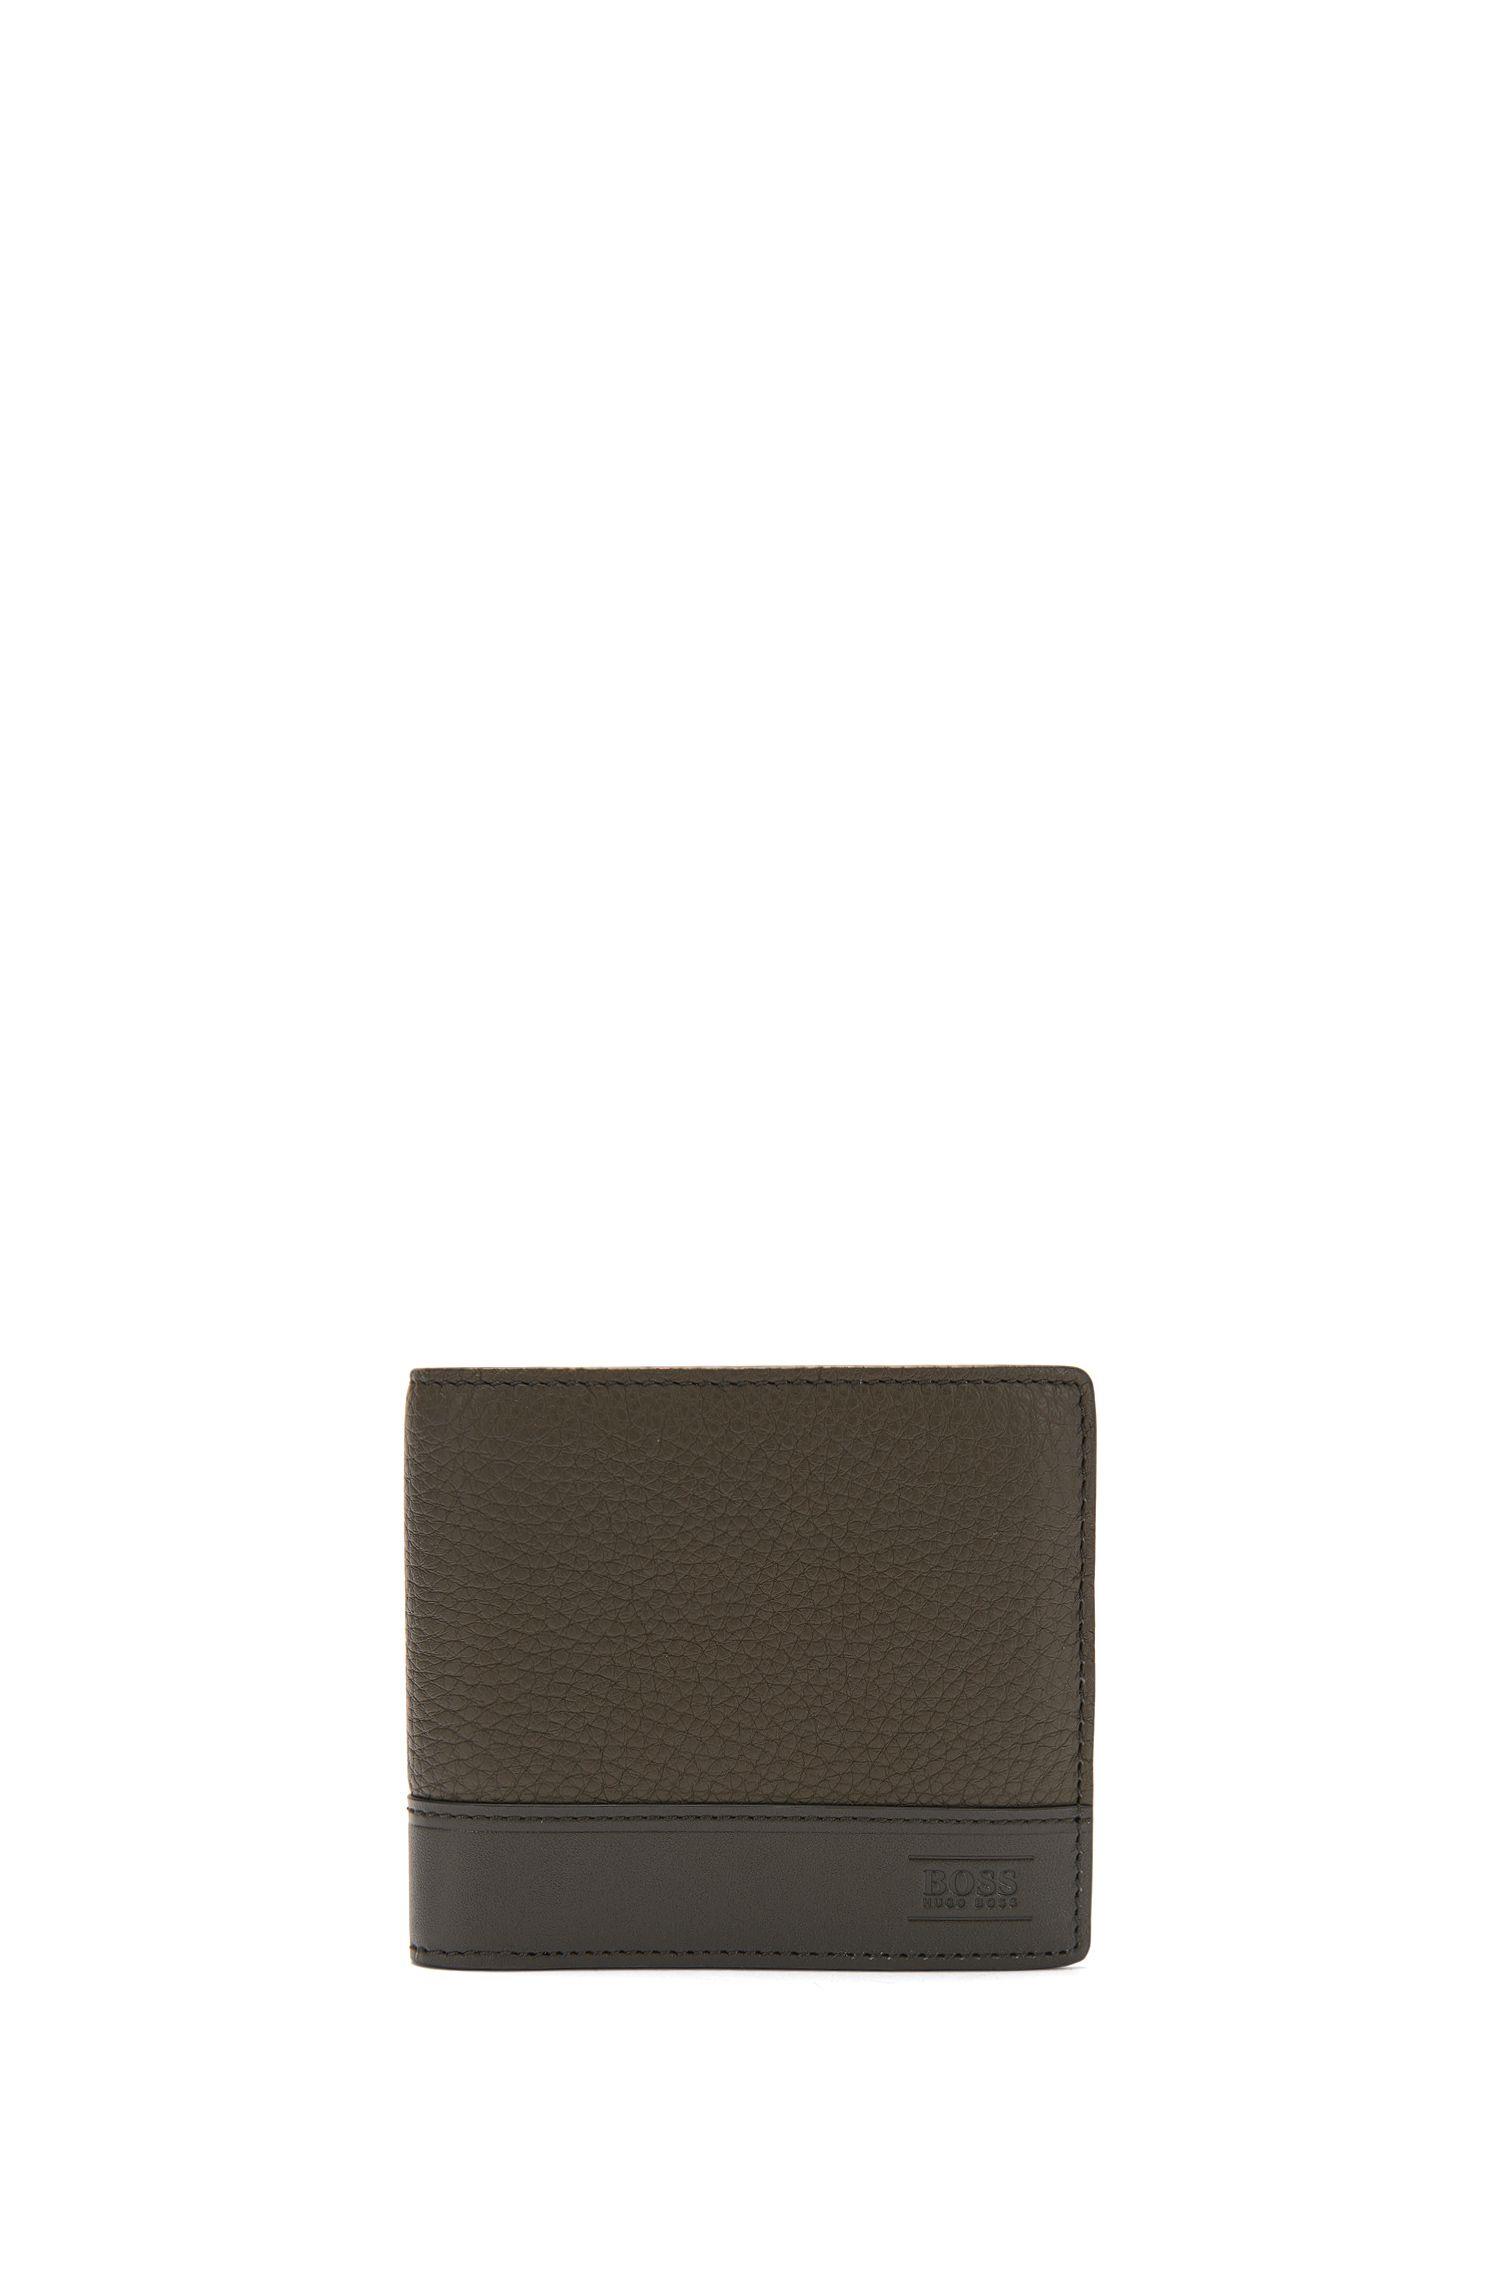 Geldbörse aus Leder mit Logo-Prägung: 'Aspen_8 cc'